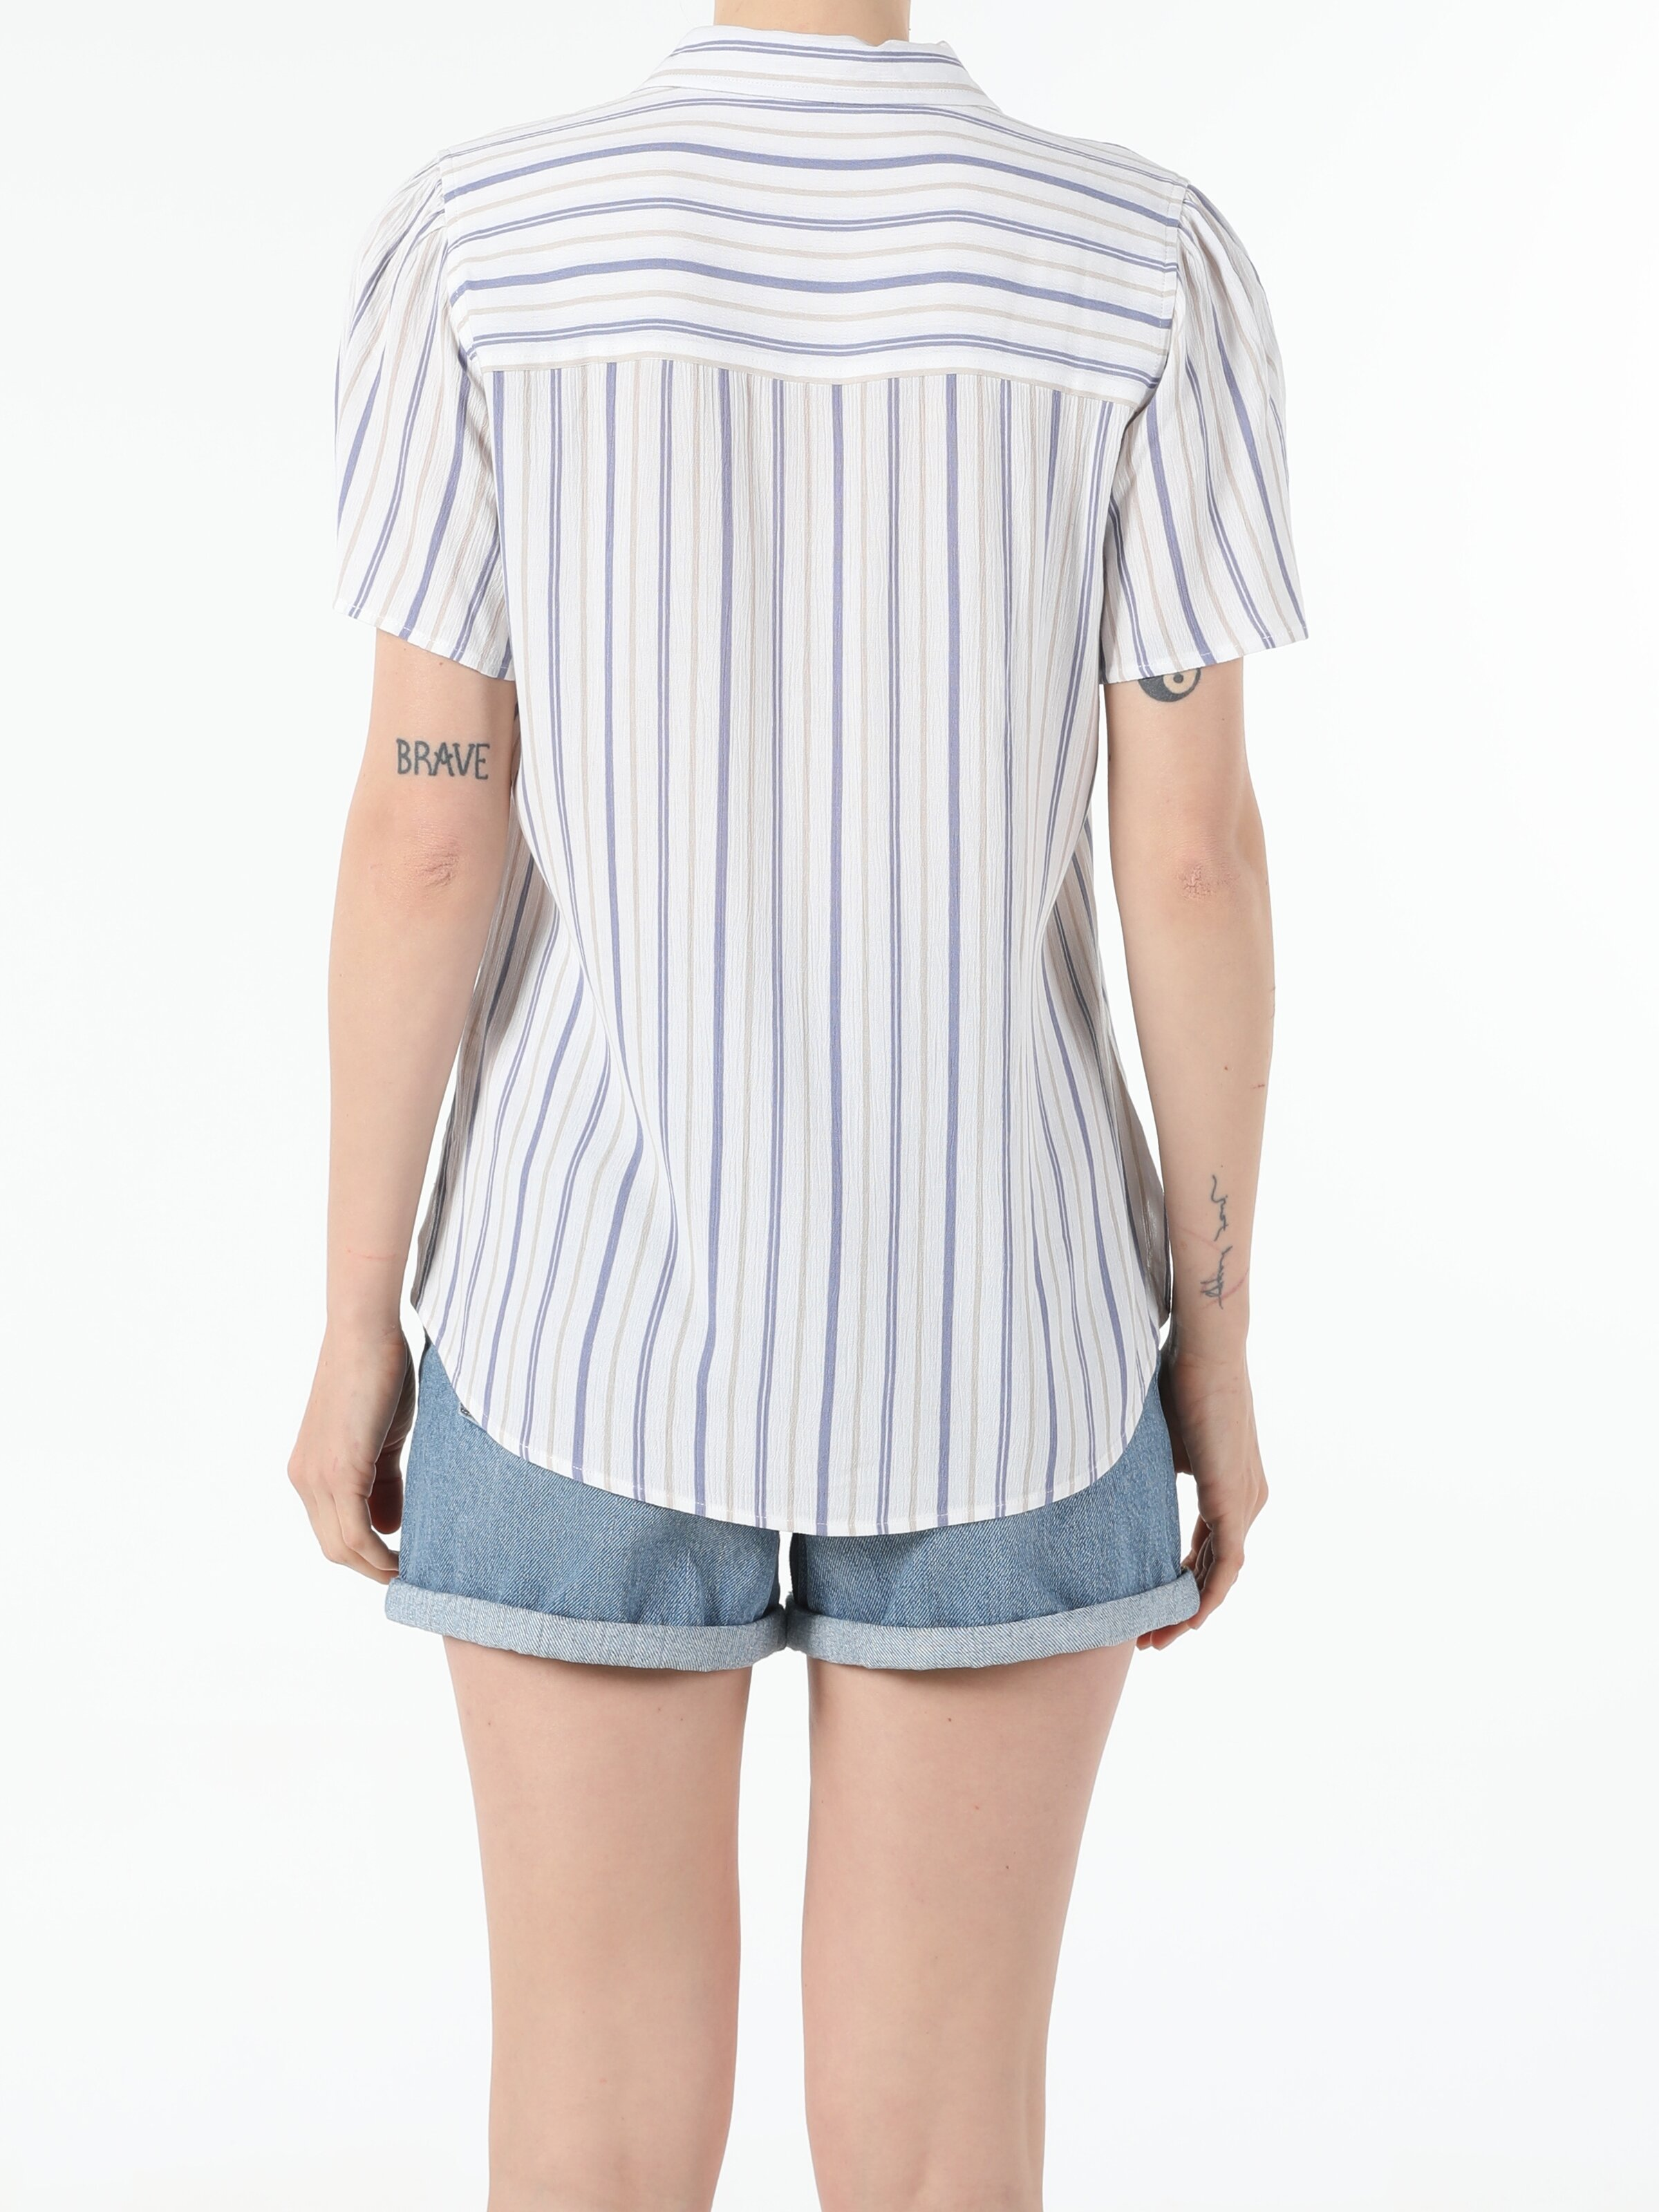 Regular Fit Shirt Neck  Kadın Kısa Kol Gömlek